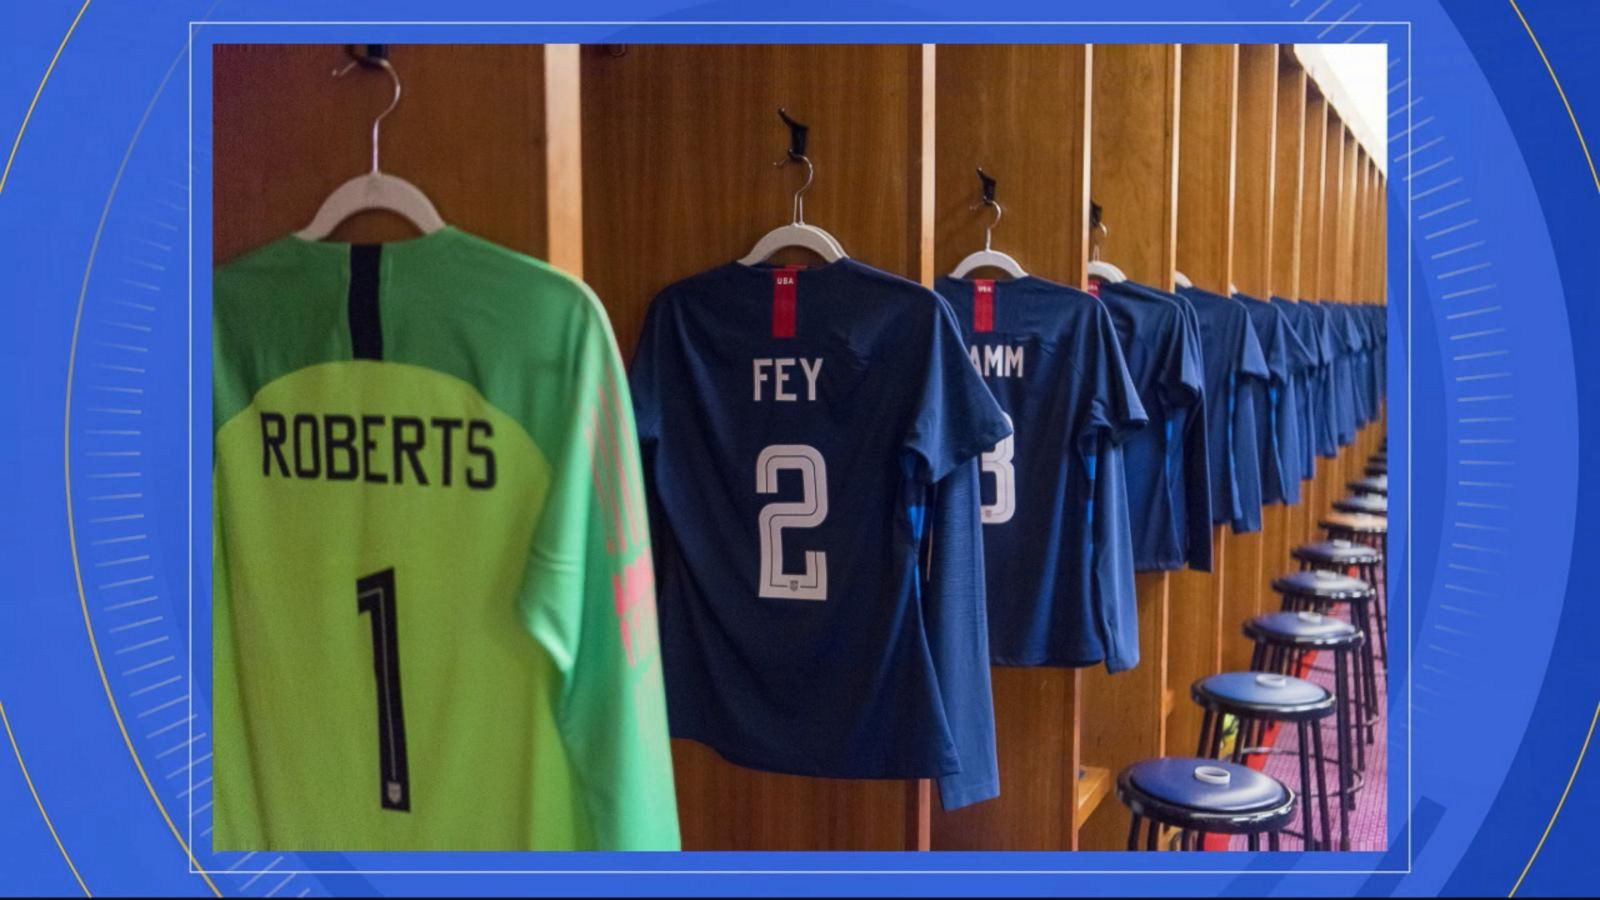 d5245c65b One crazy dreamer inspires the next   Women s national soccer team ...